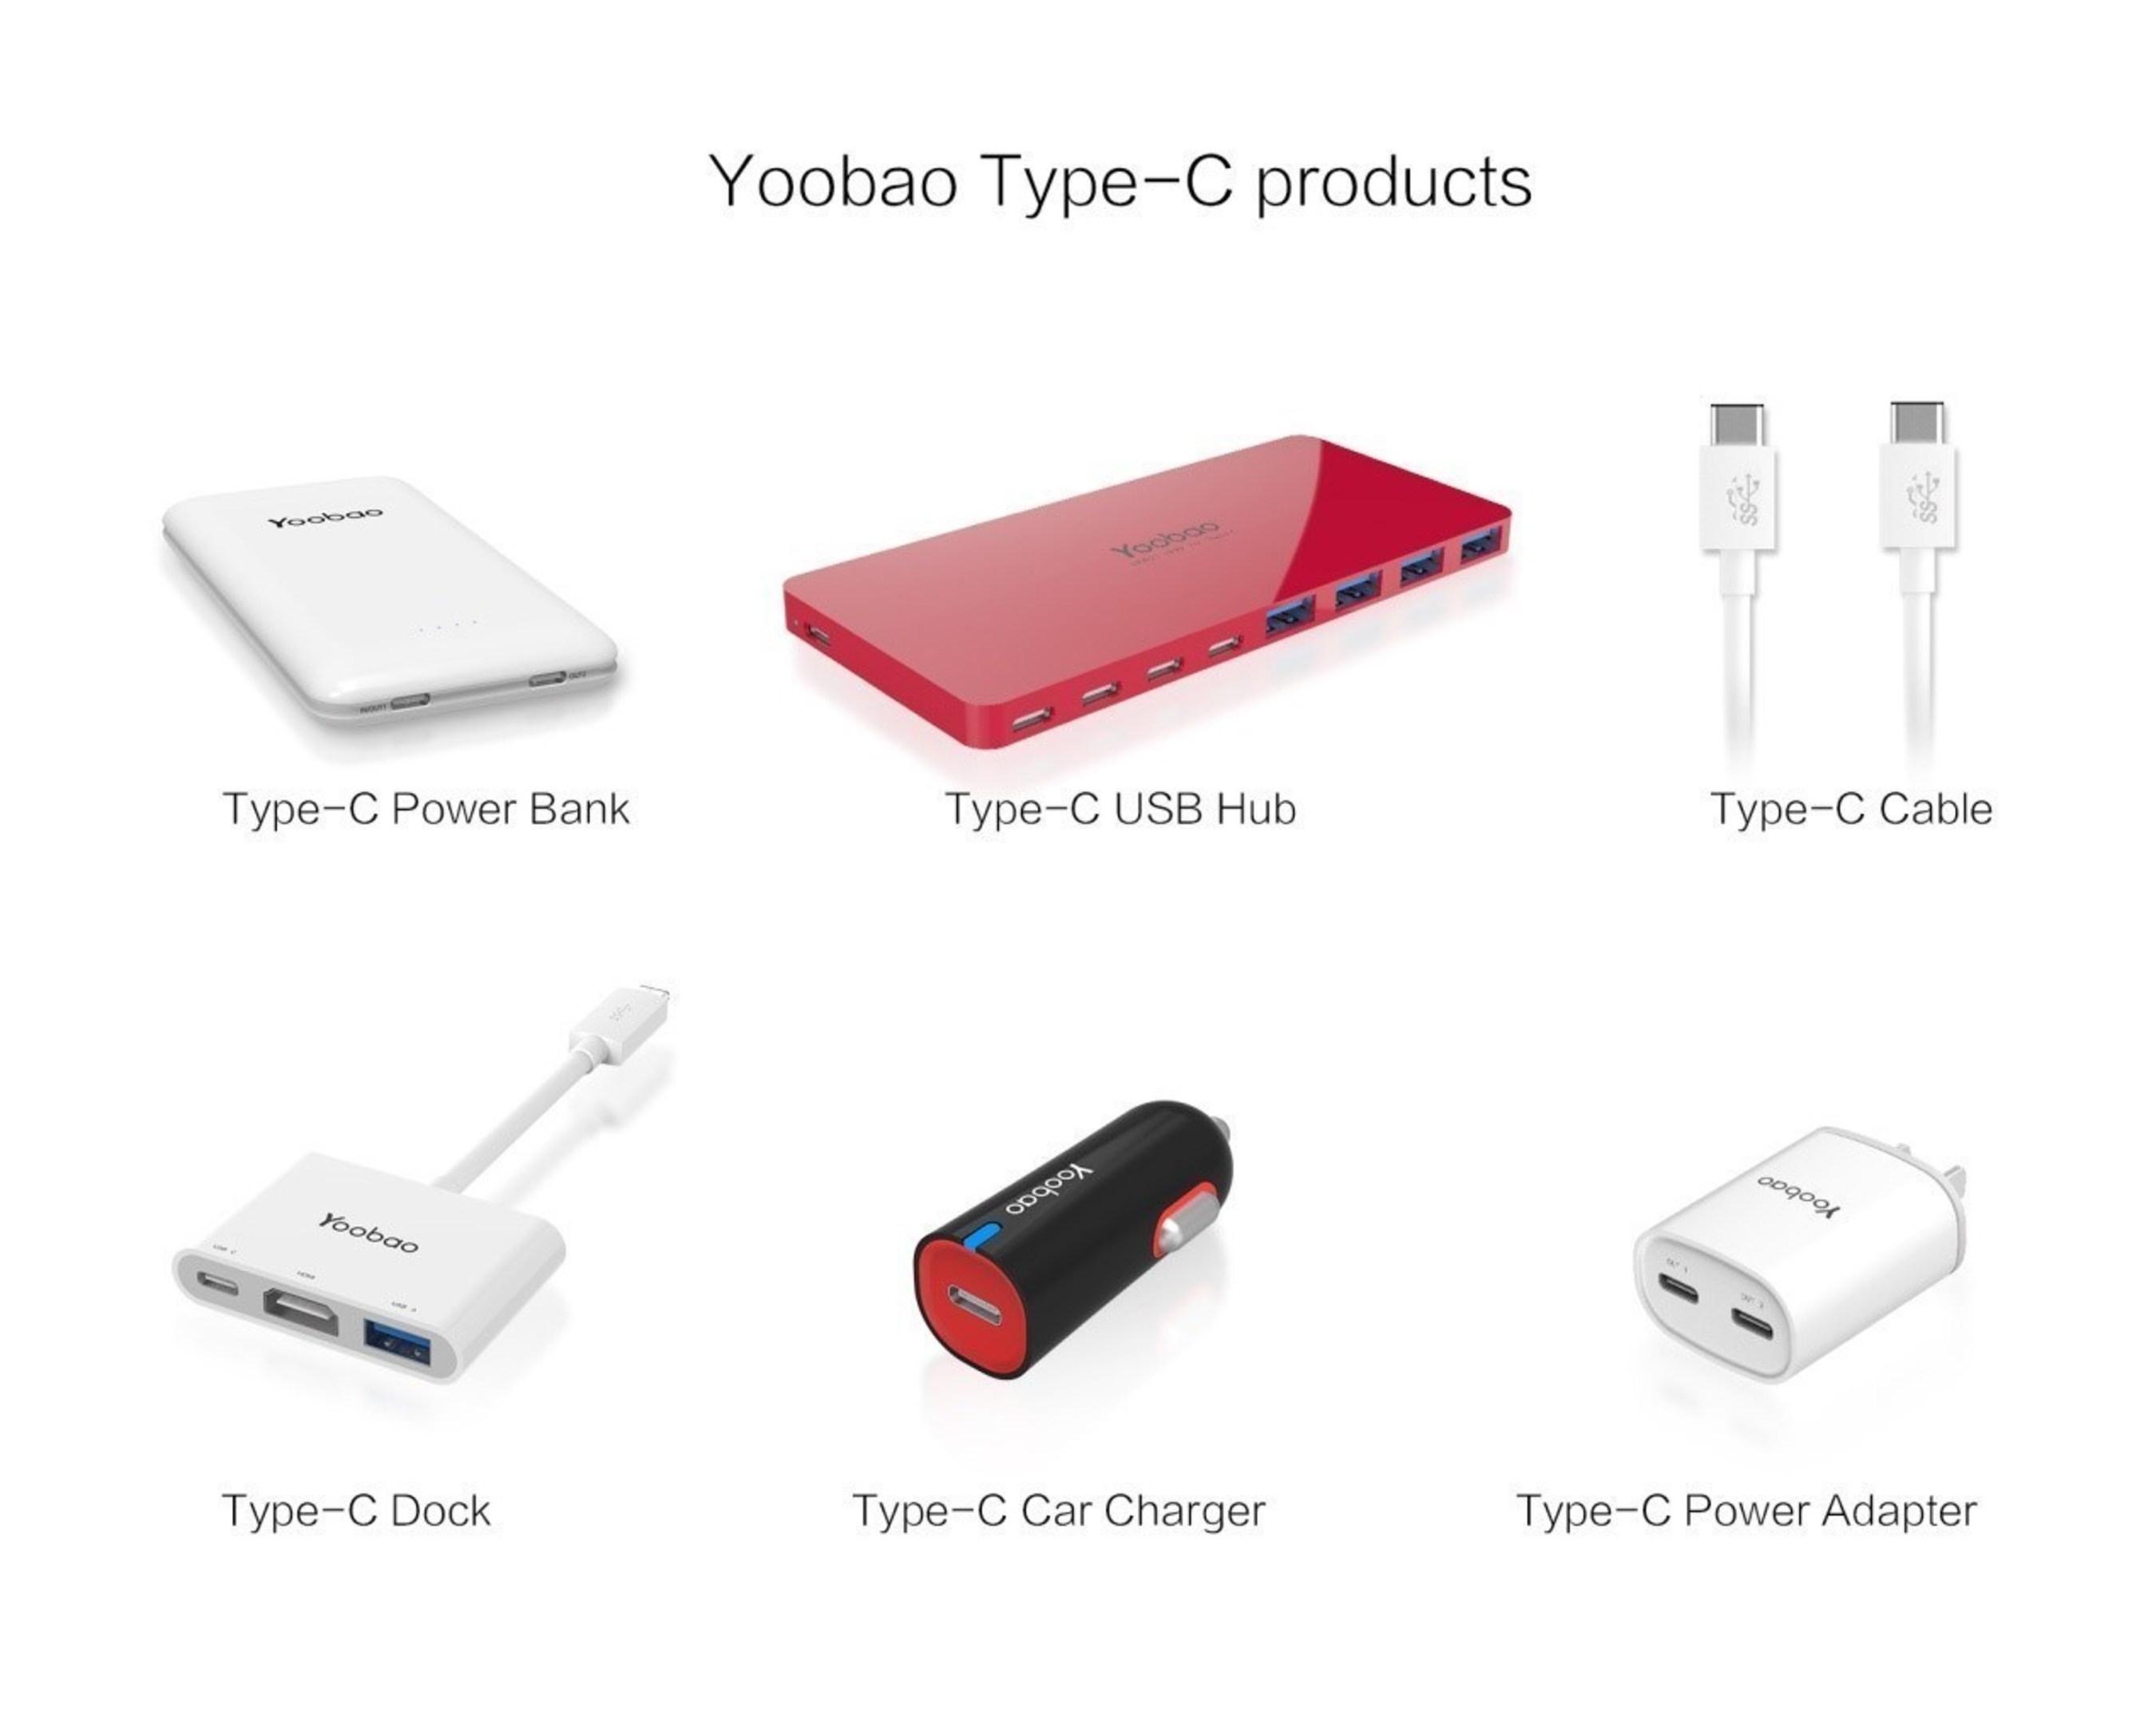 Yoobao Type-C series products